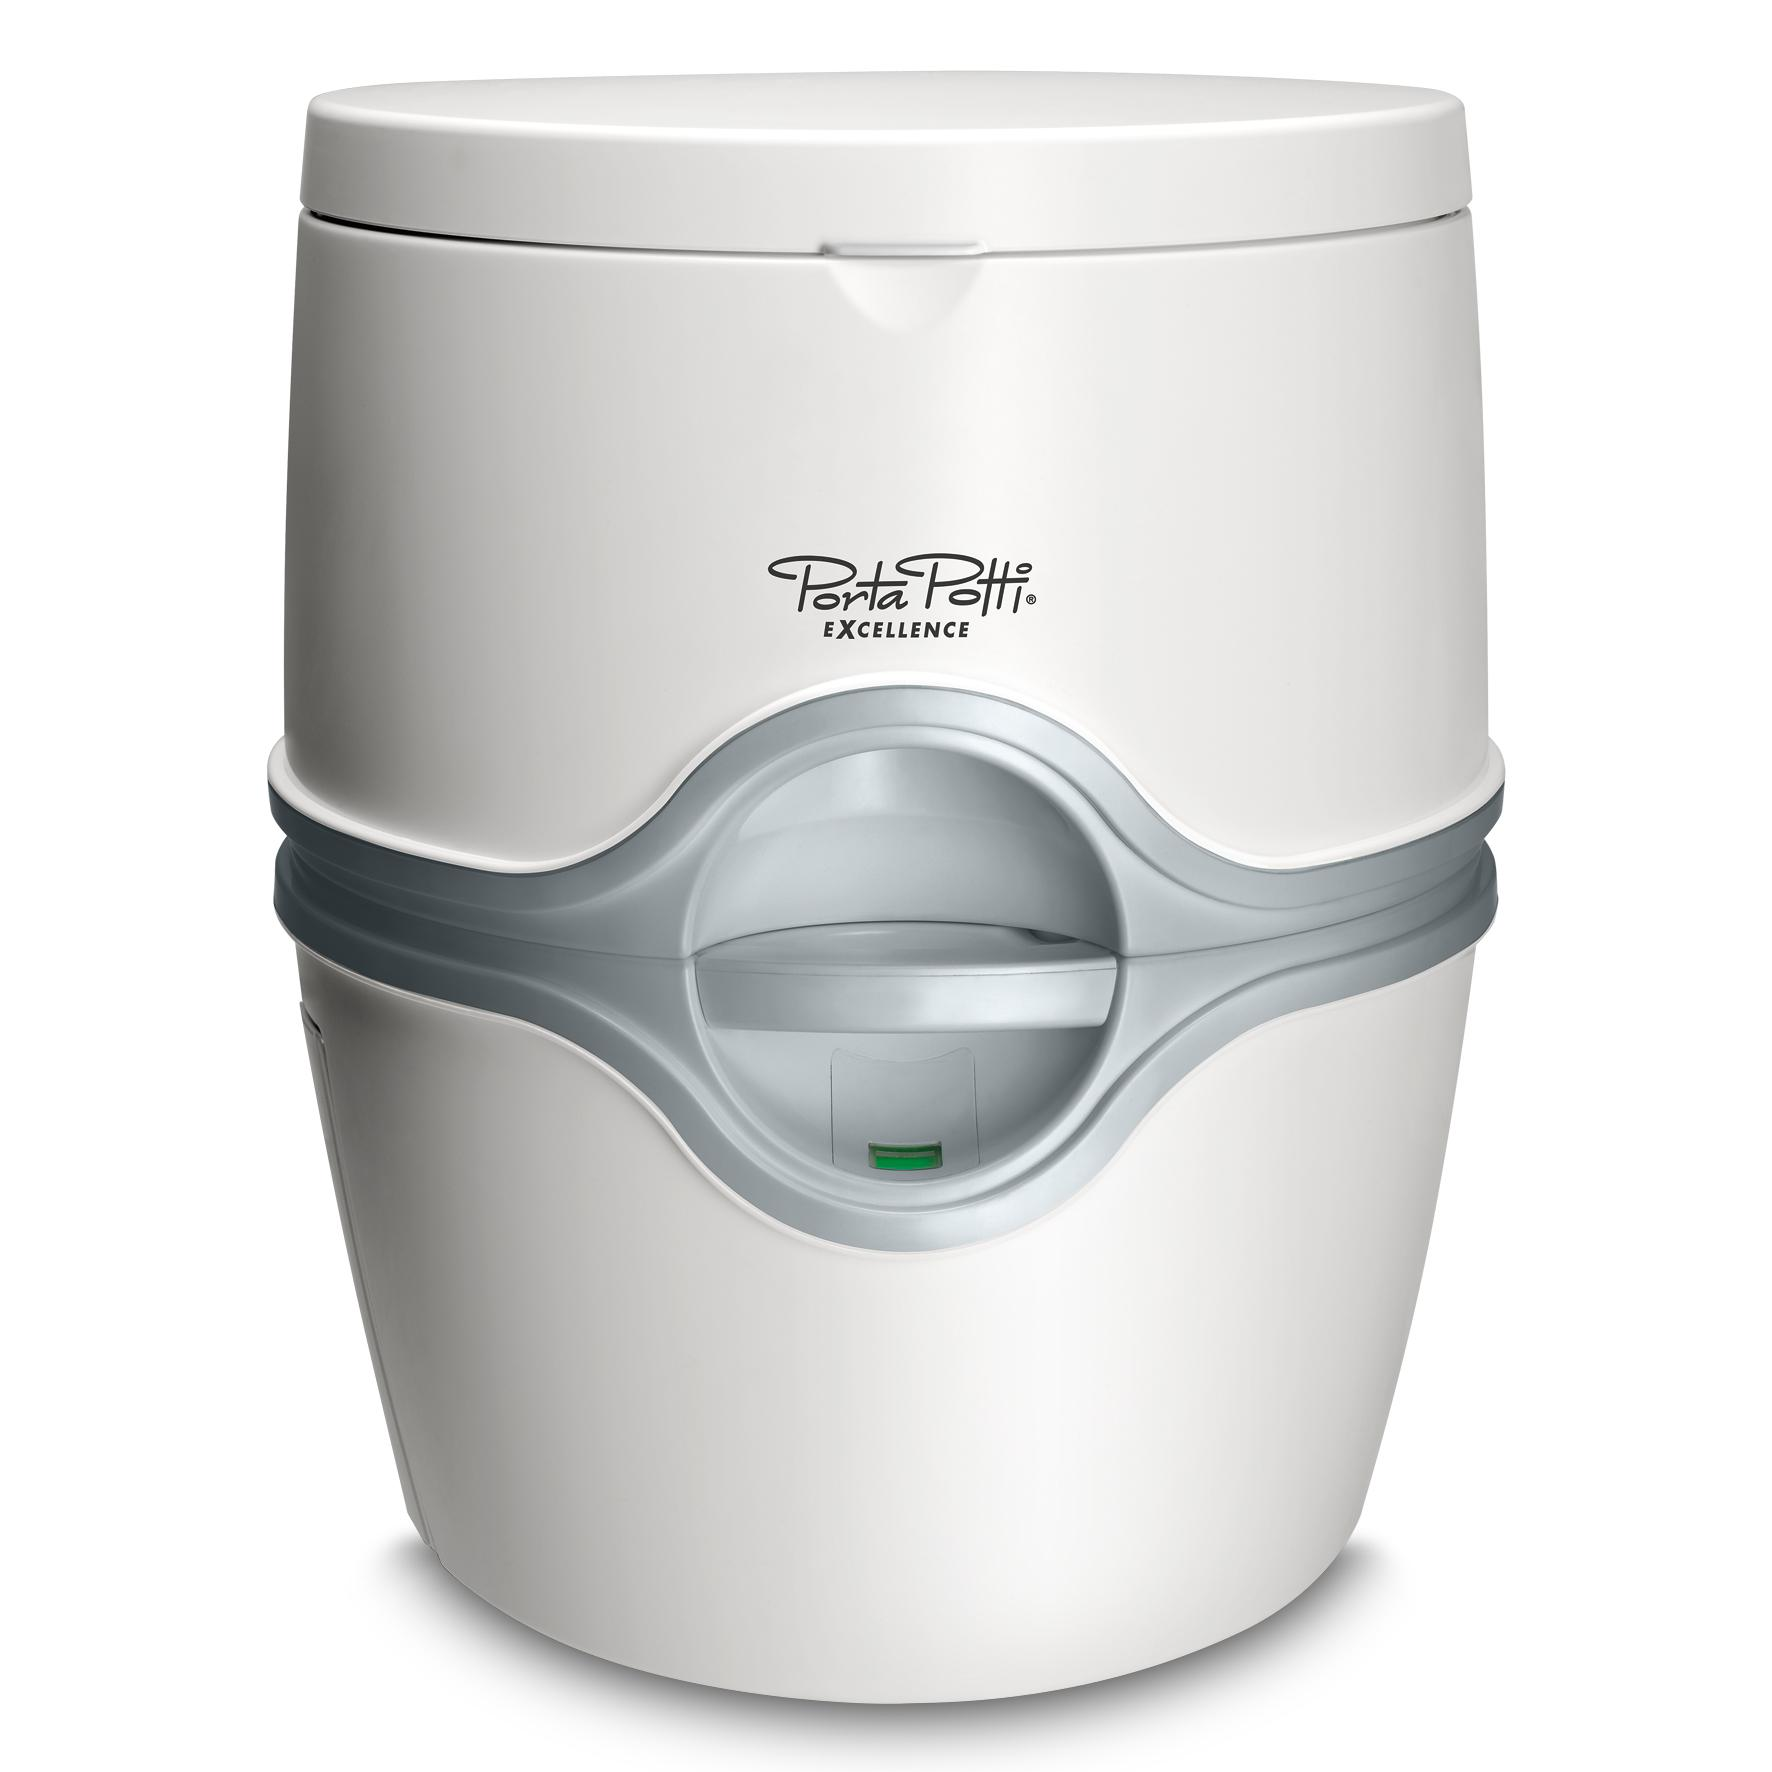 Thetford Přenosné WC Thetford Porta Potti Excellence 565 Electric